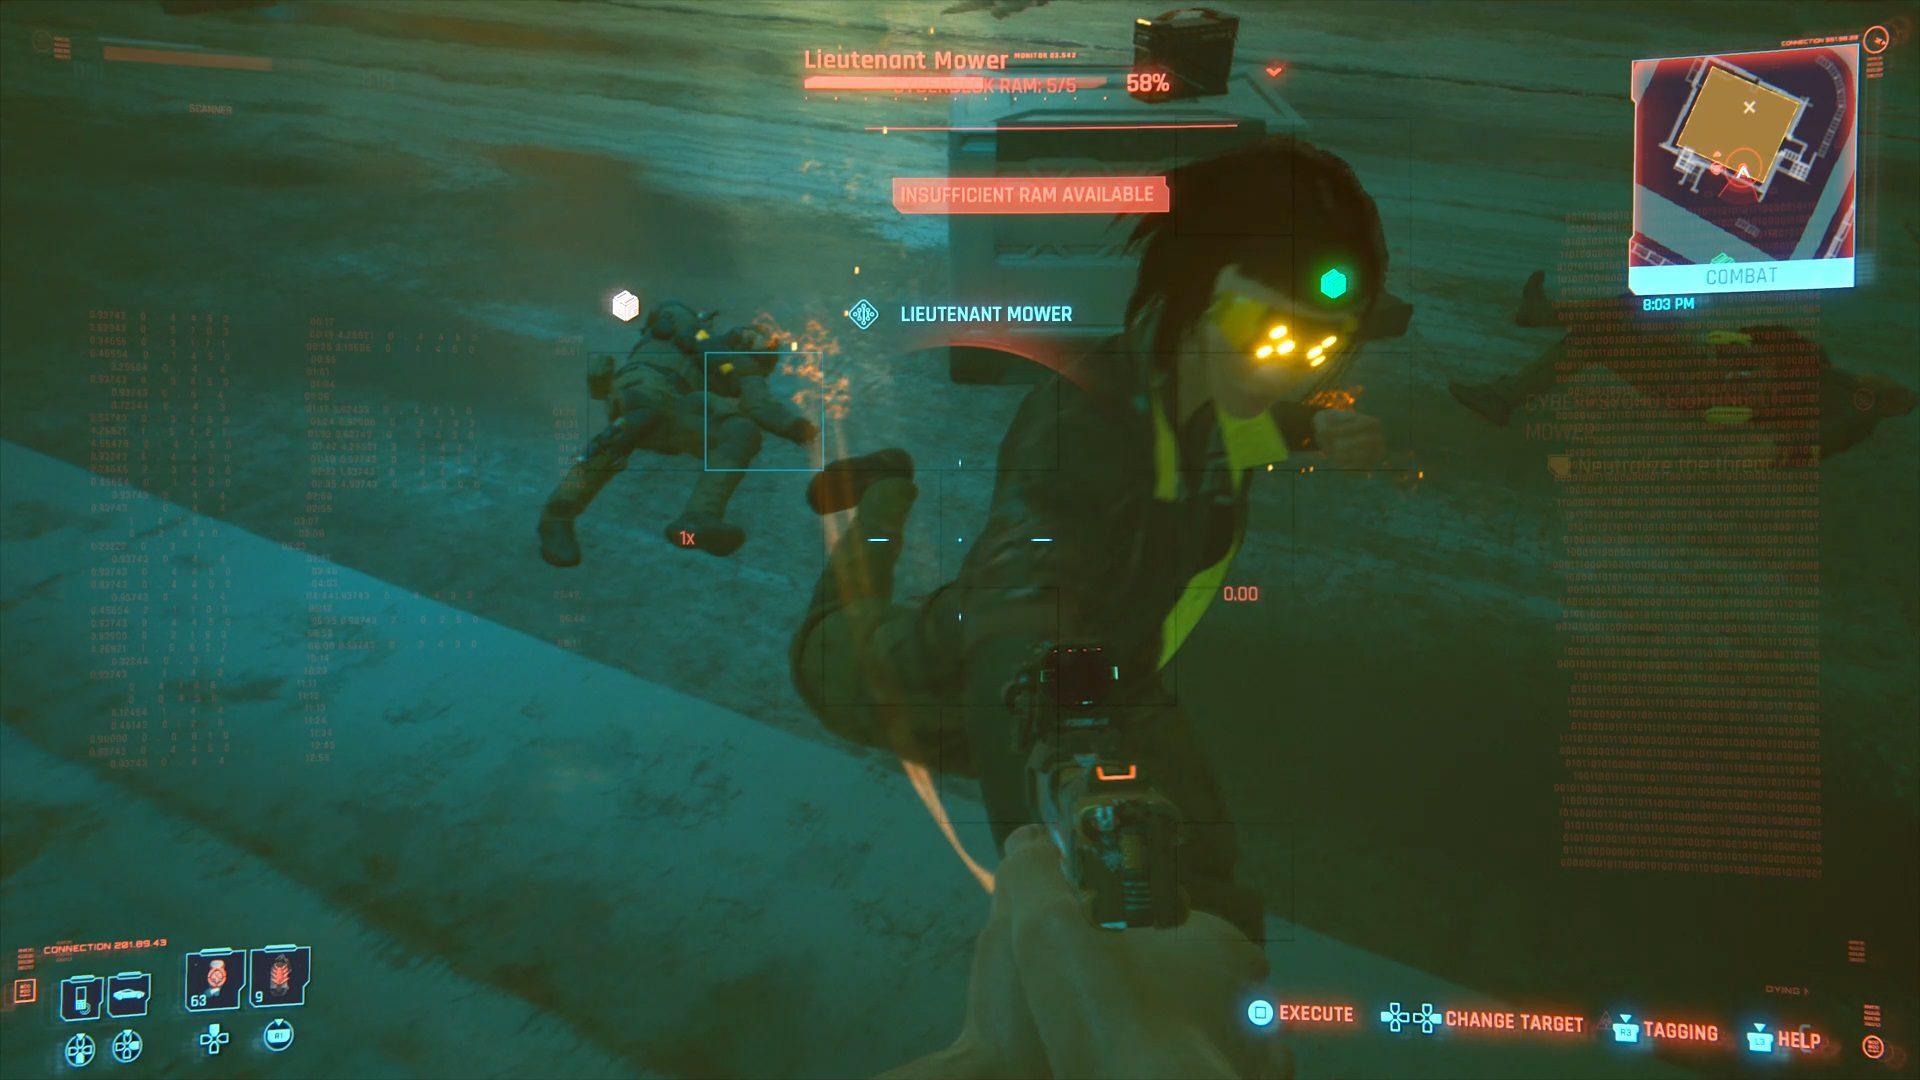 Cyberpunk 2077 Lt Mower Cyberpsycho Sighting